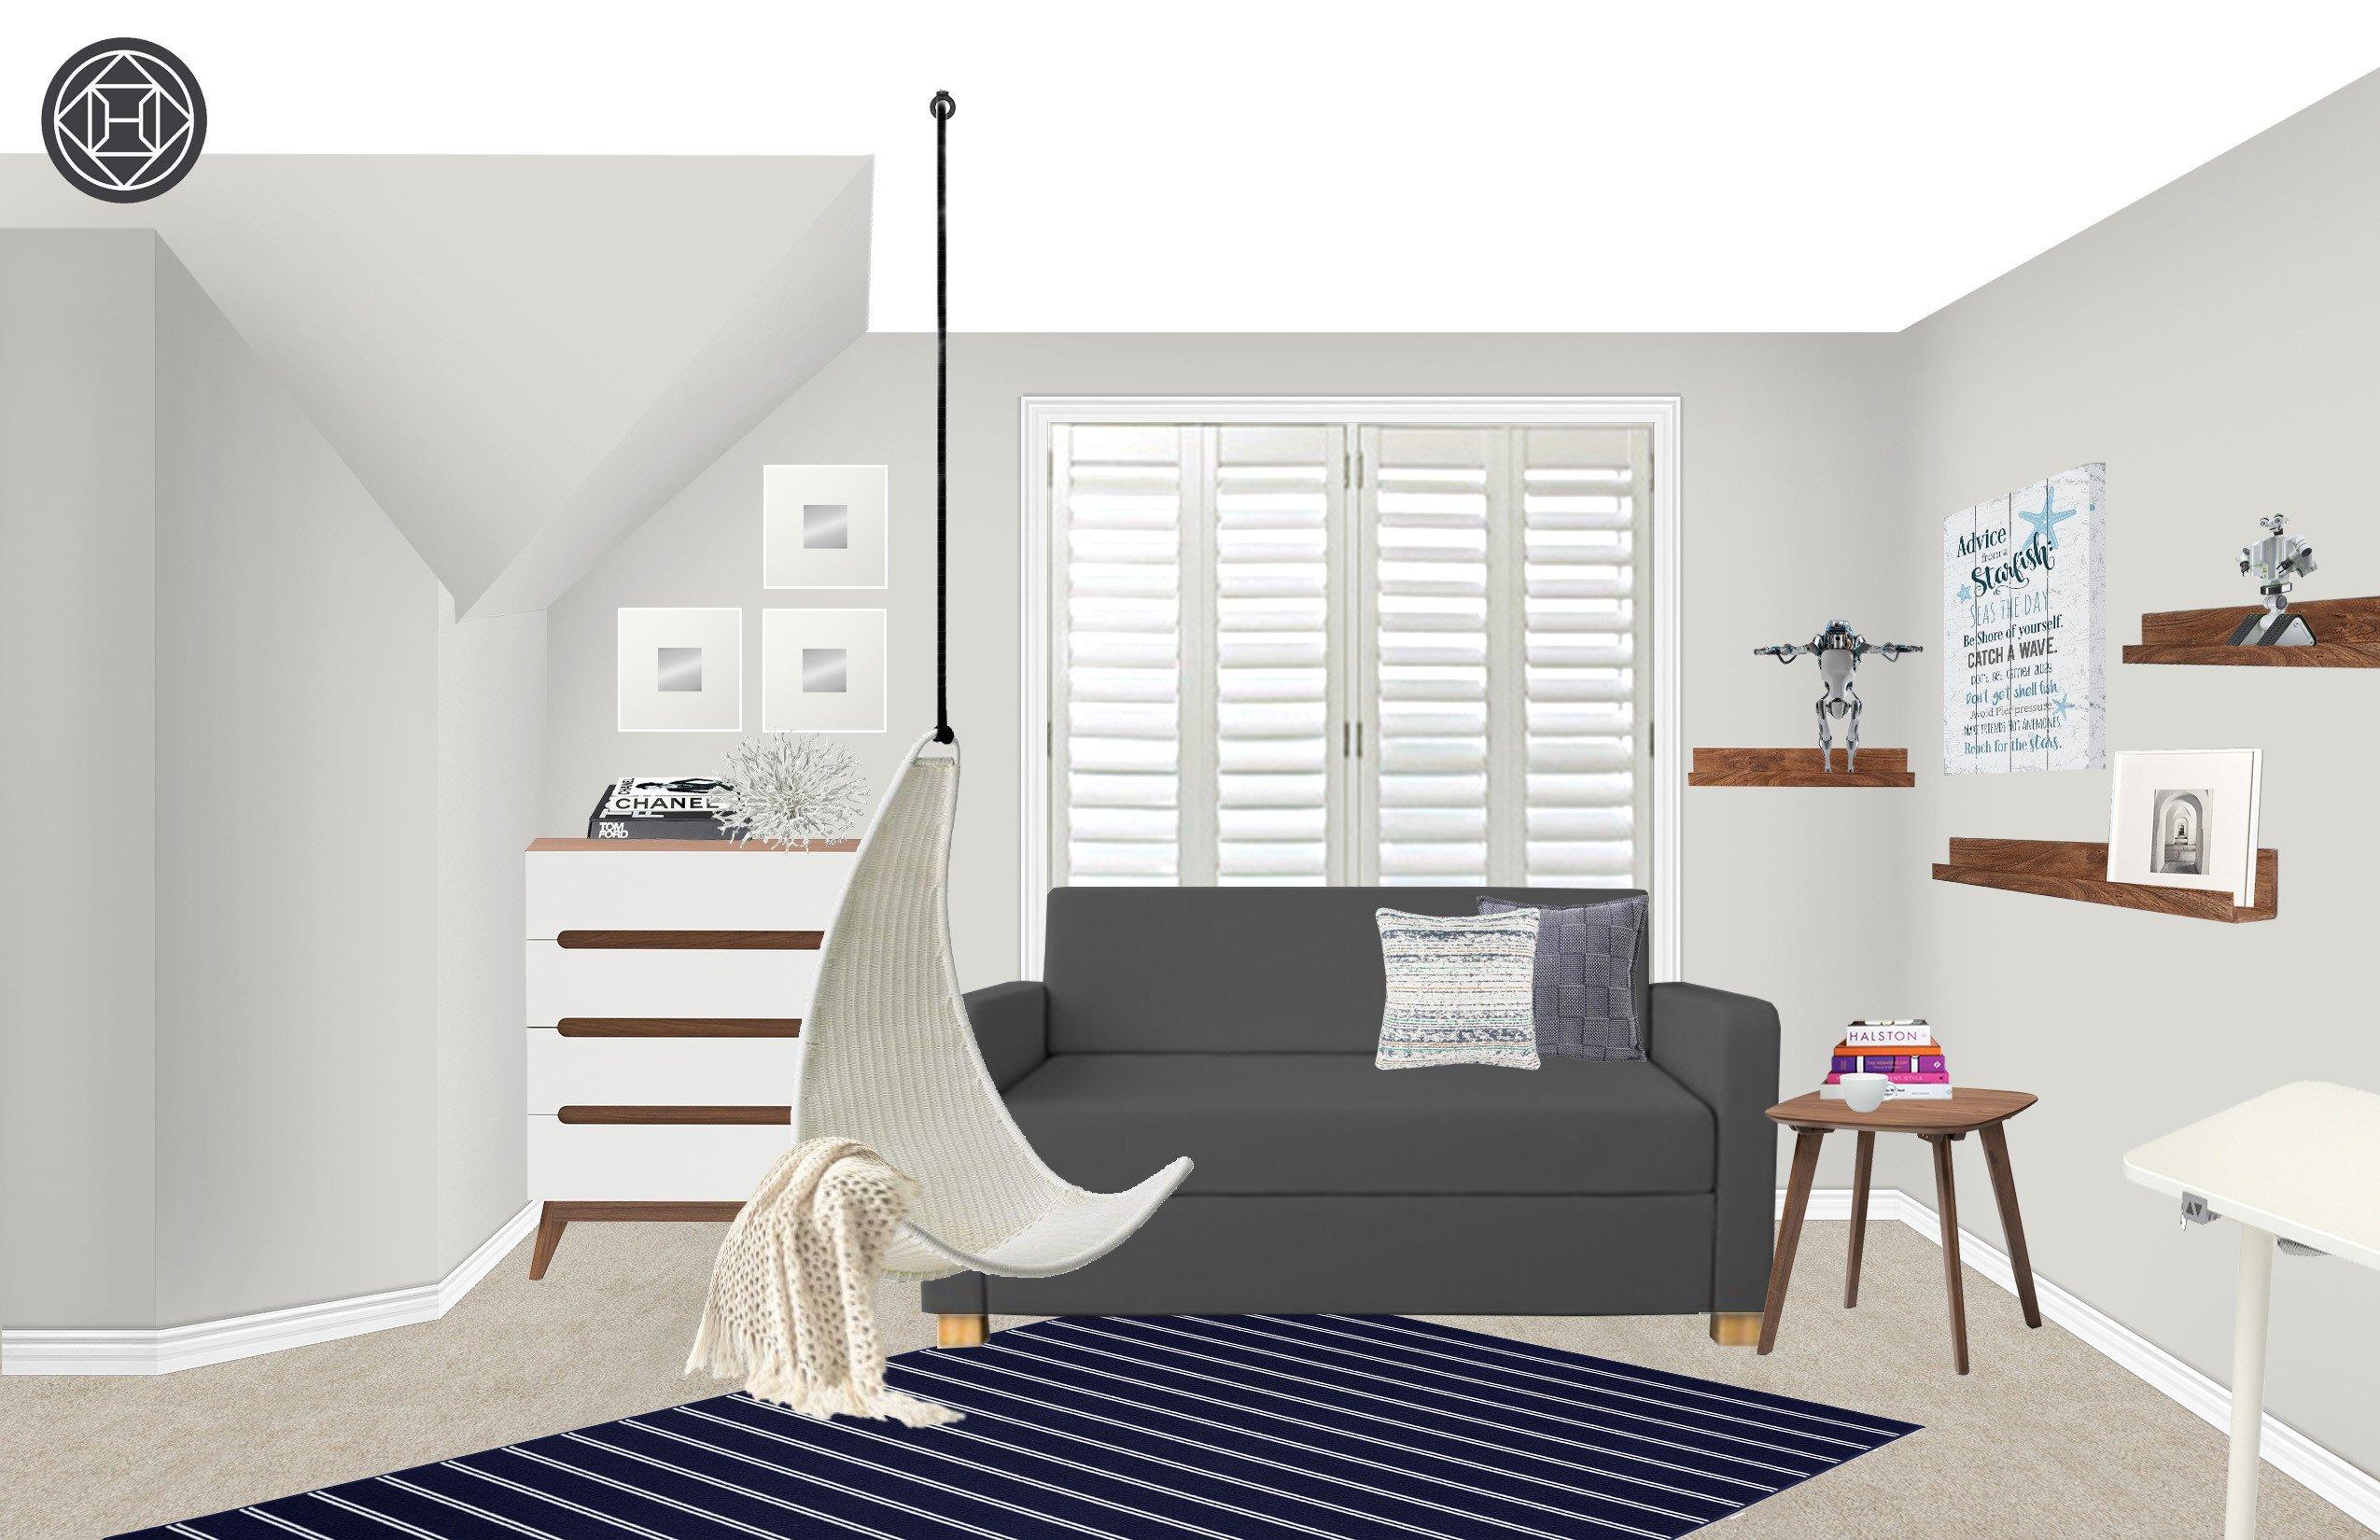 Mid Century Modern Bedroom Furniture Inspirational Coastal Midcentury Modern Bedroom Design by Havenly